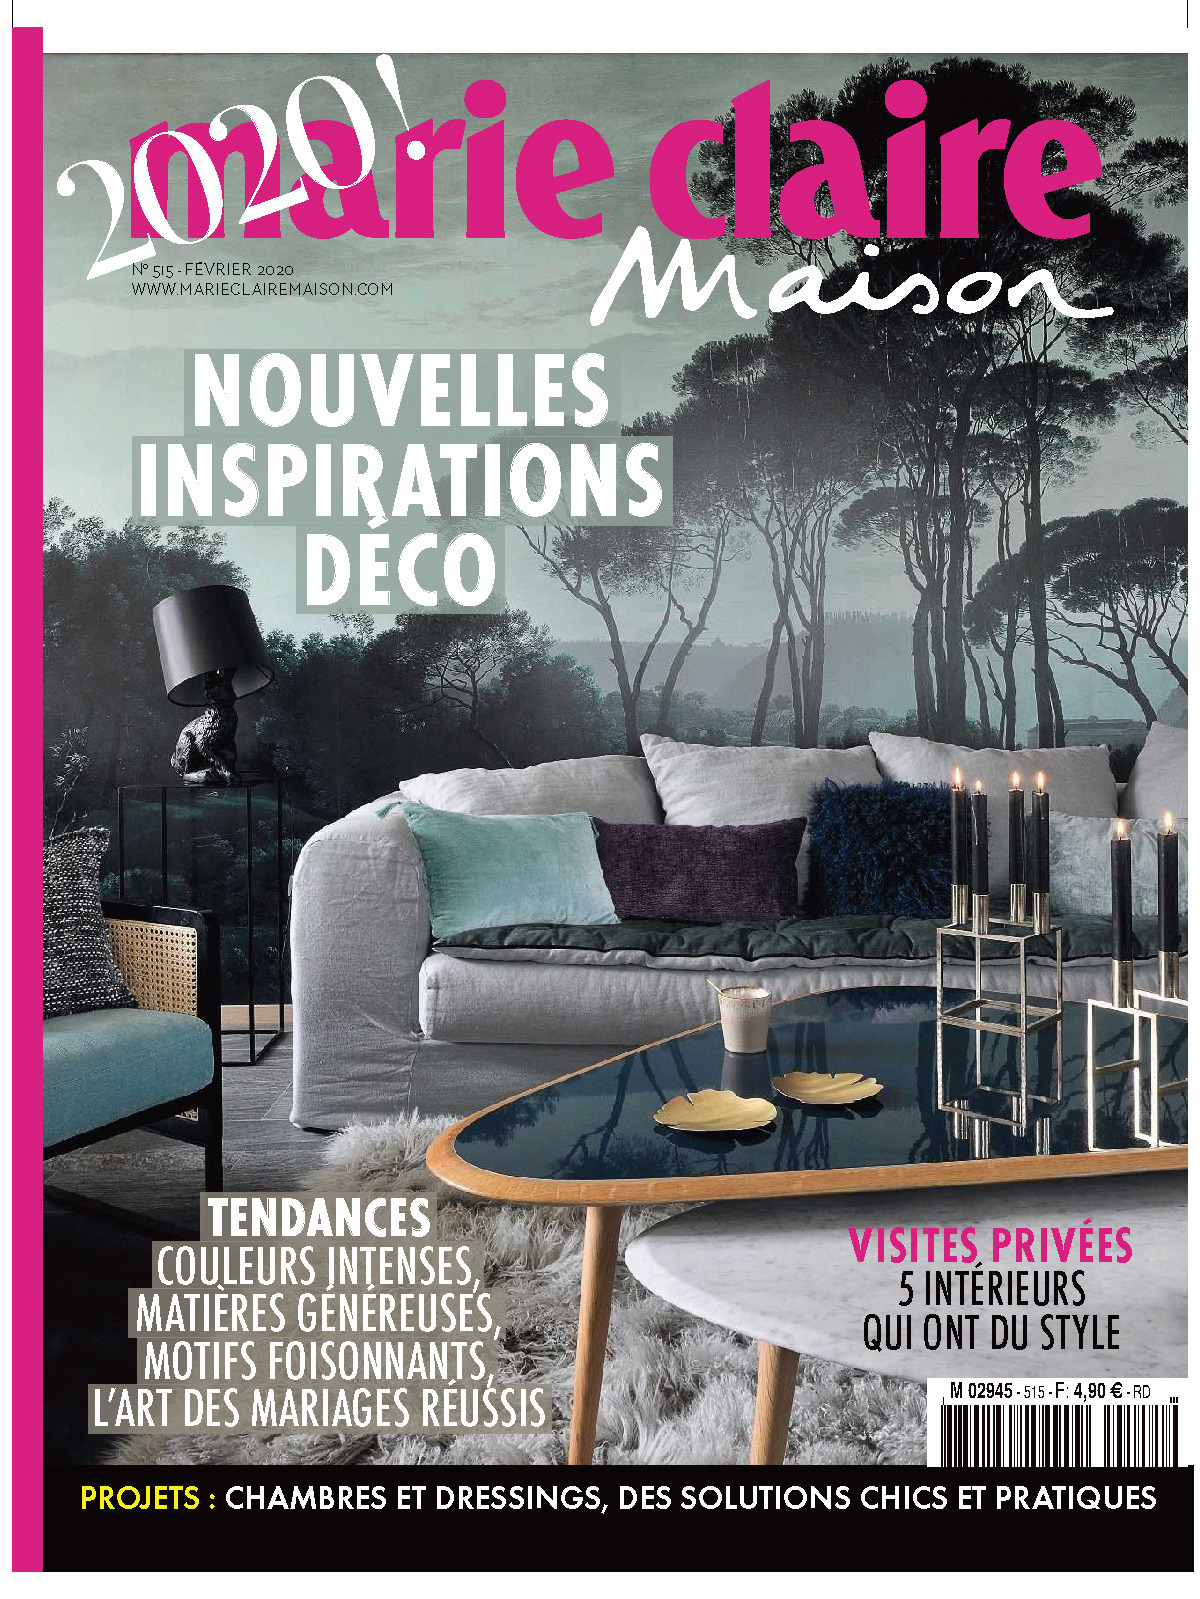 《Marie Claire maison》法国版时尚室内设计杂志2020年02月号